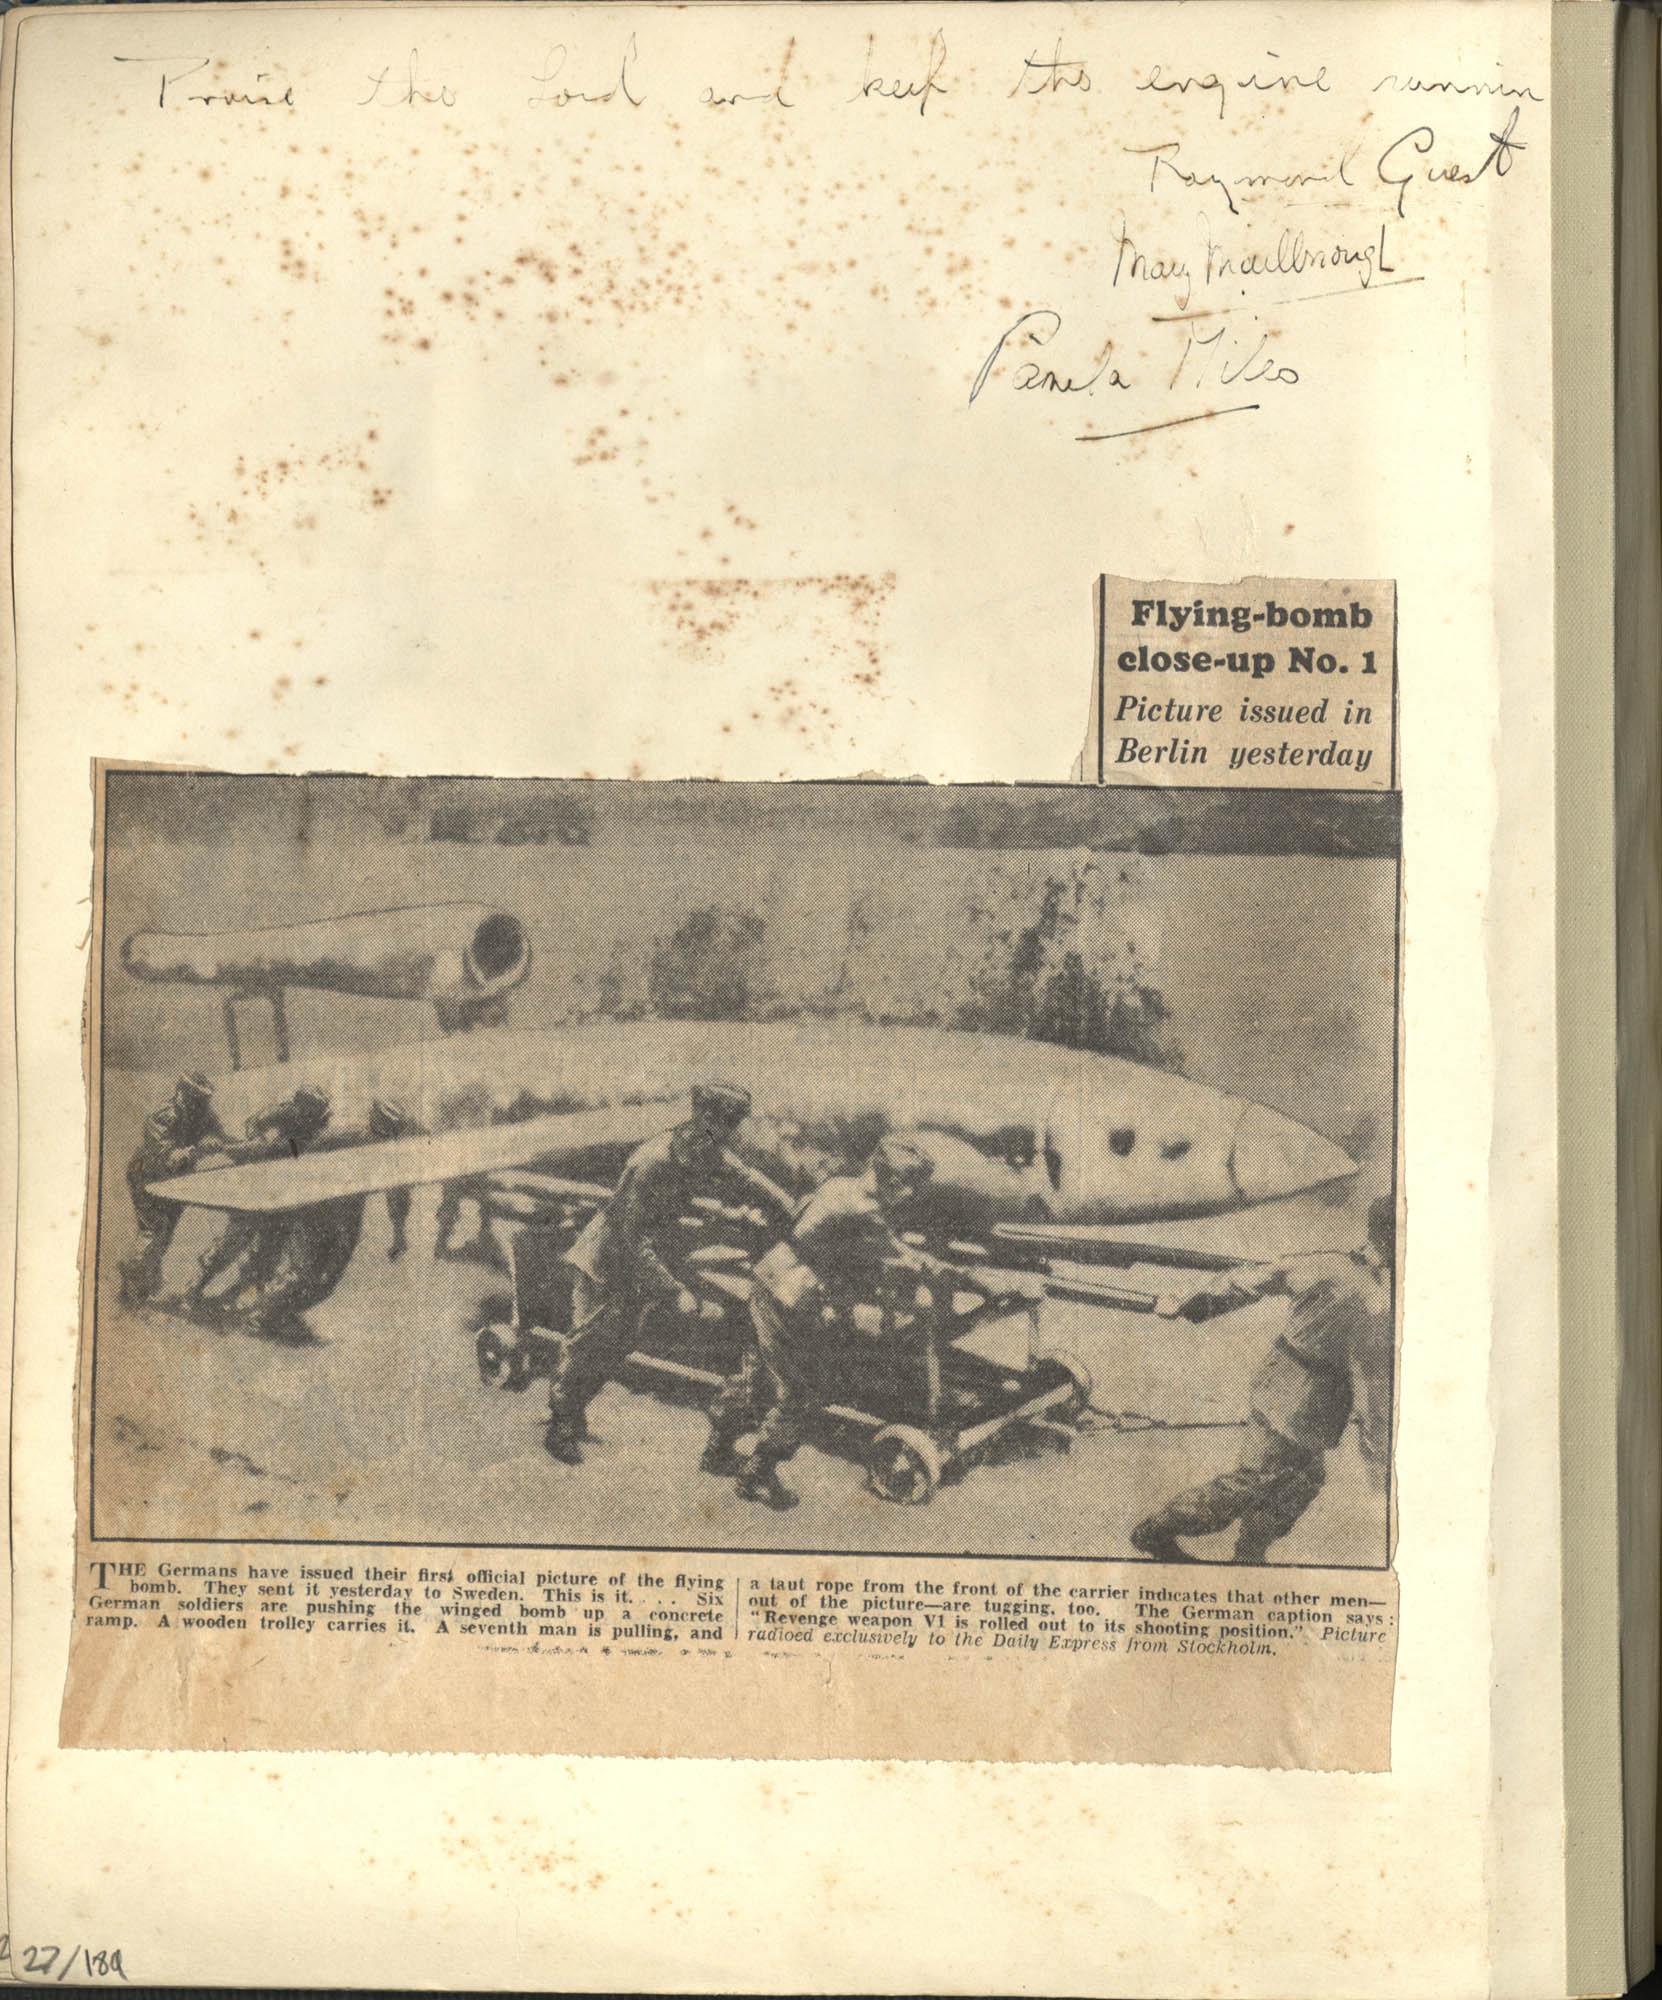 Gertrude Legendre OSS Scrapbook, 1944, Page 27